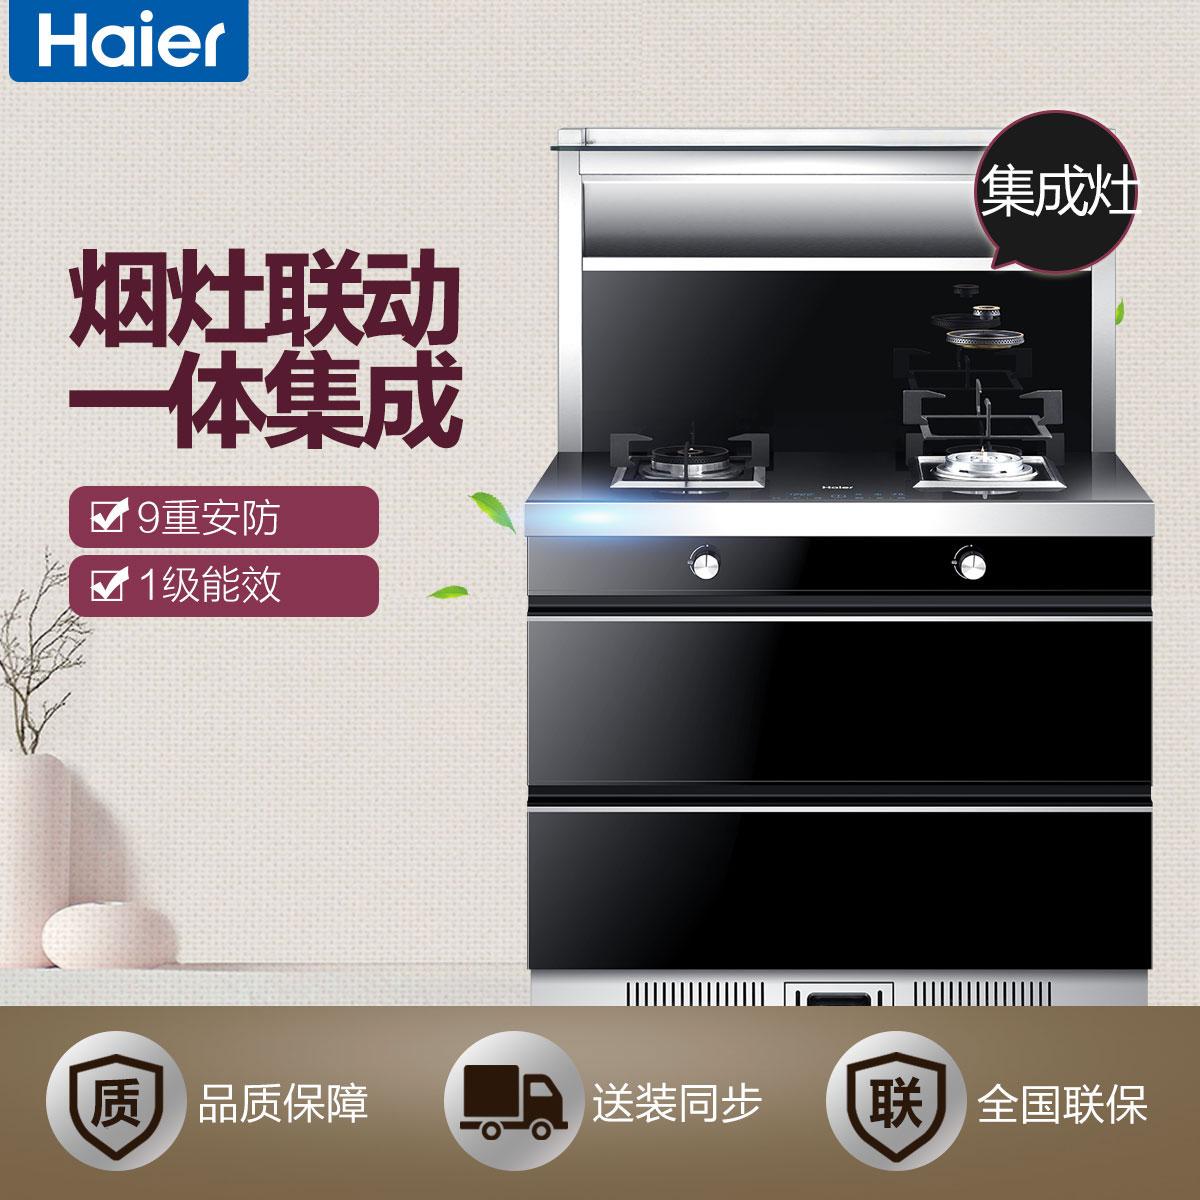 Haier/海尔 厨房电器 集成灶 JJZT-JE9C(12T)